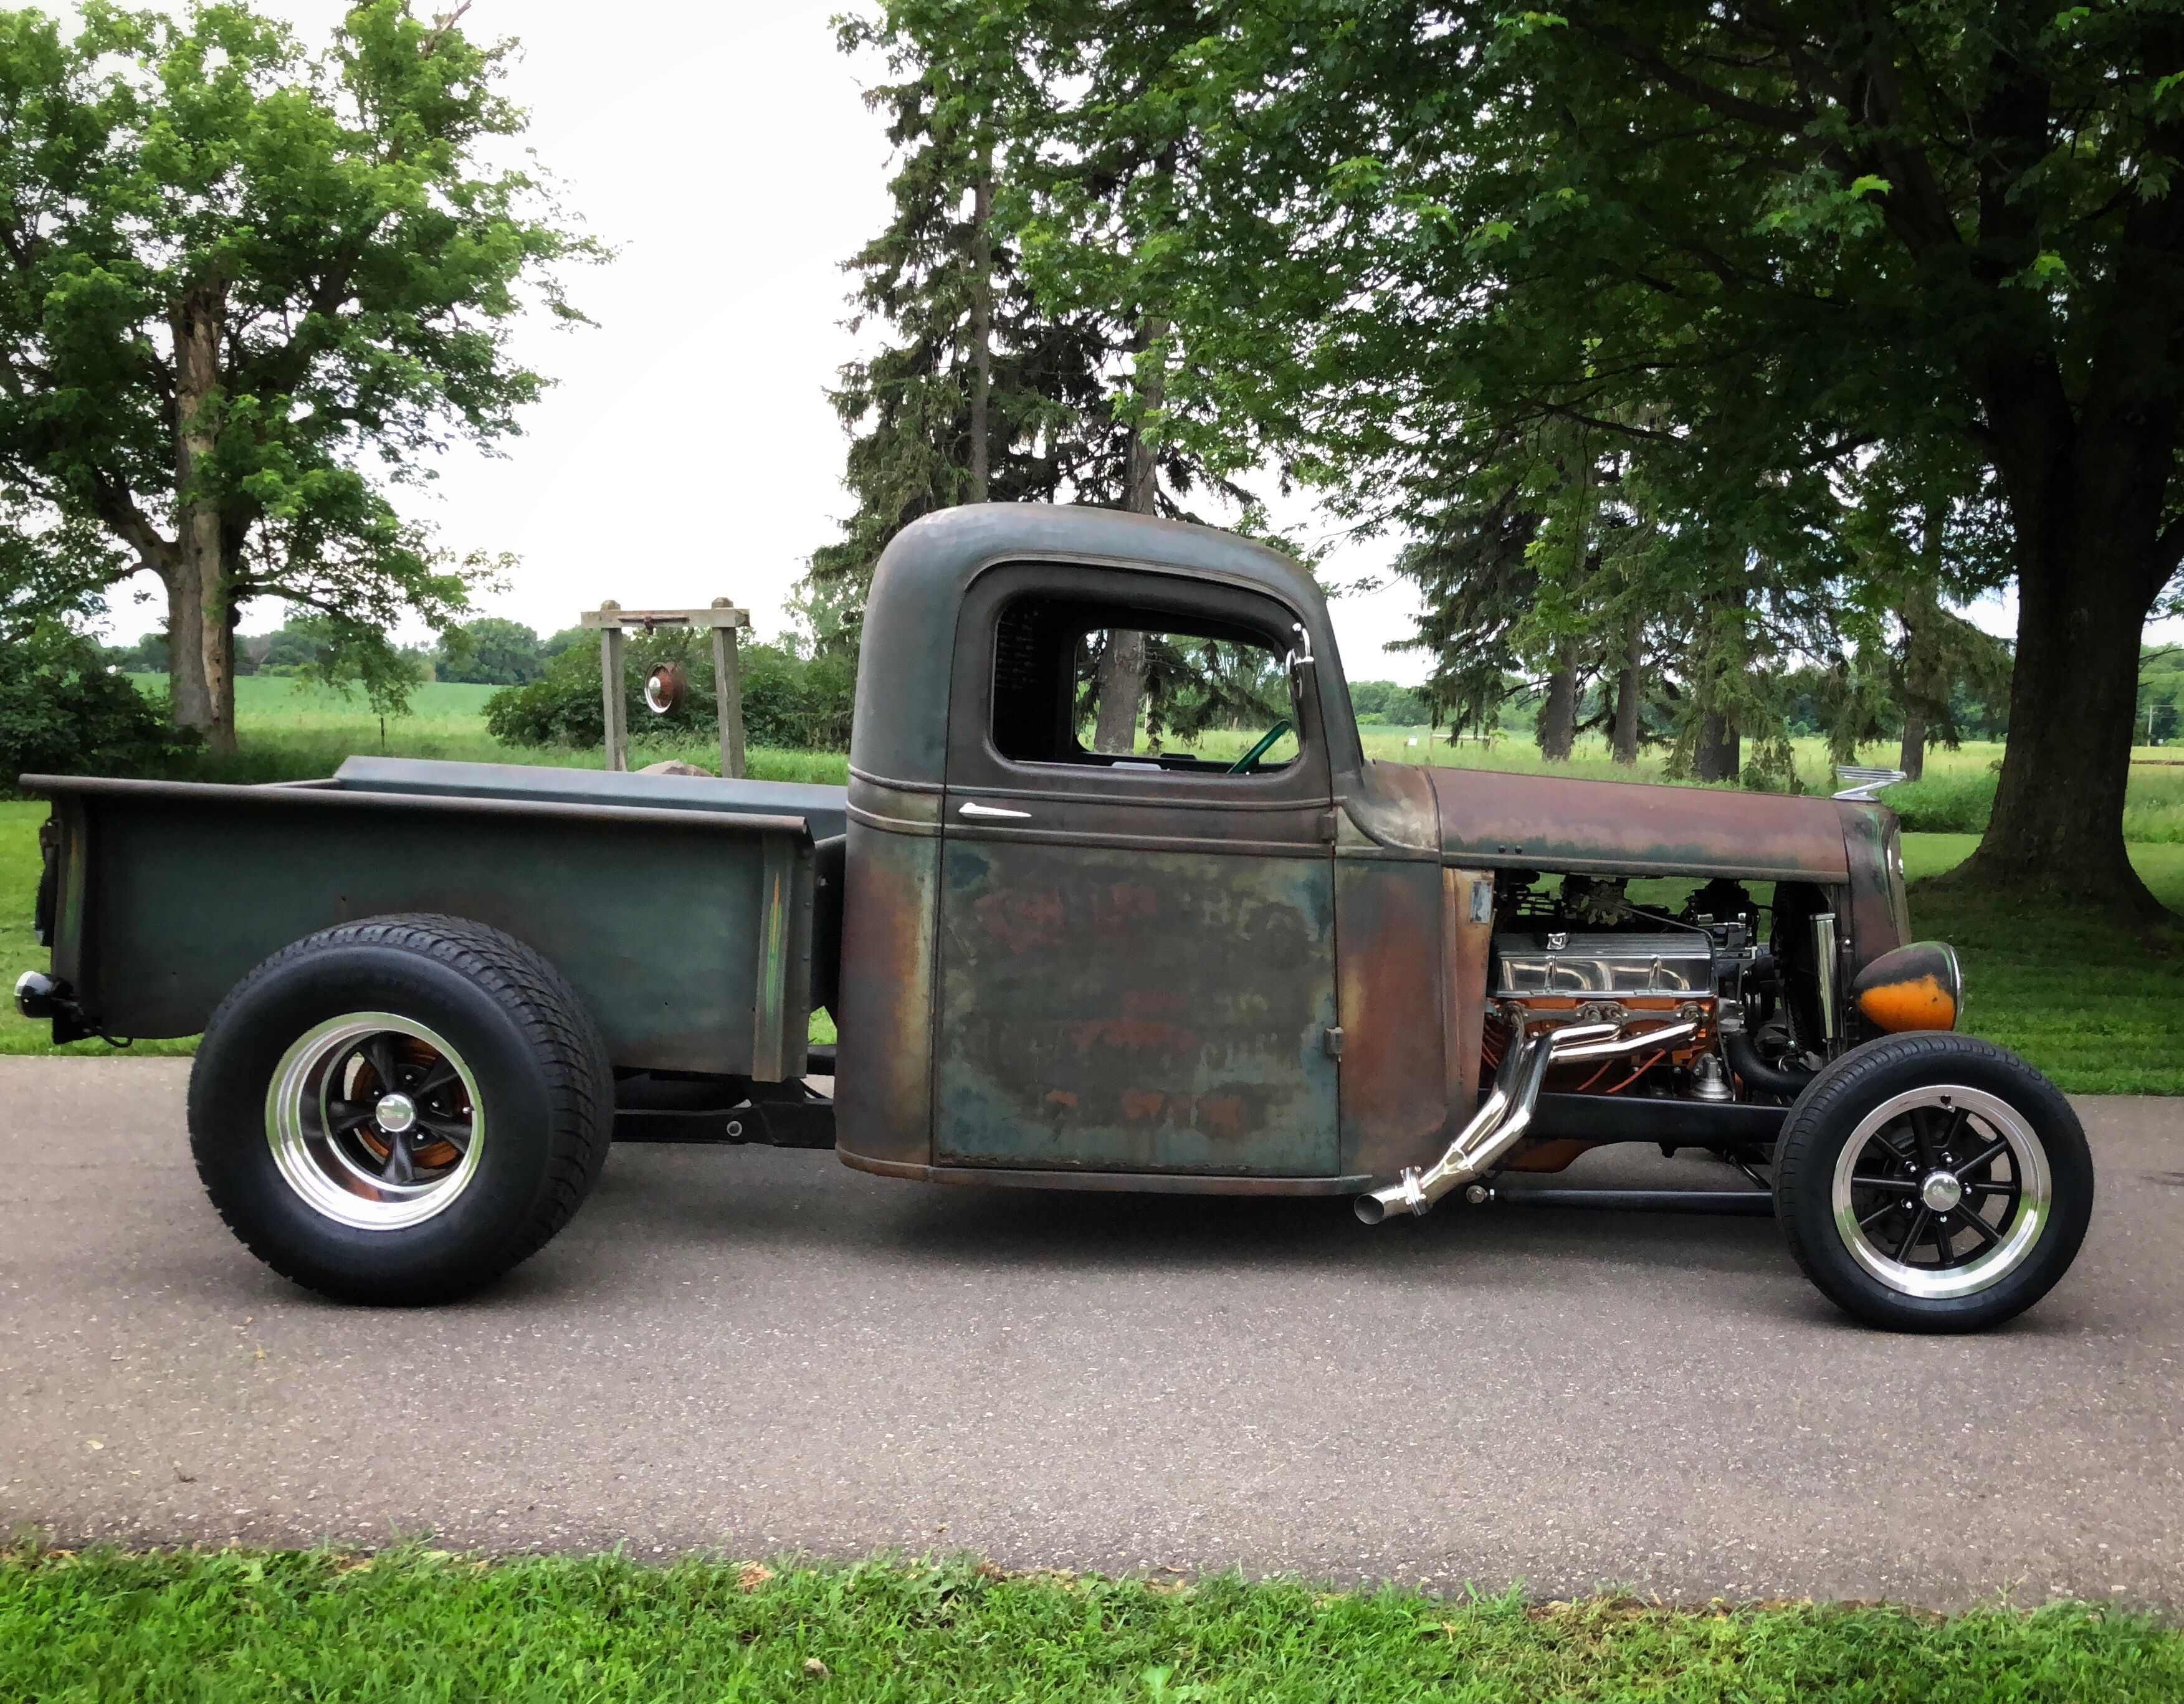 1937 Chevrolet Rat Rod Pickup Truck Rat Rods Truck Rat Rod Hot Rod Trucks